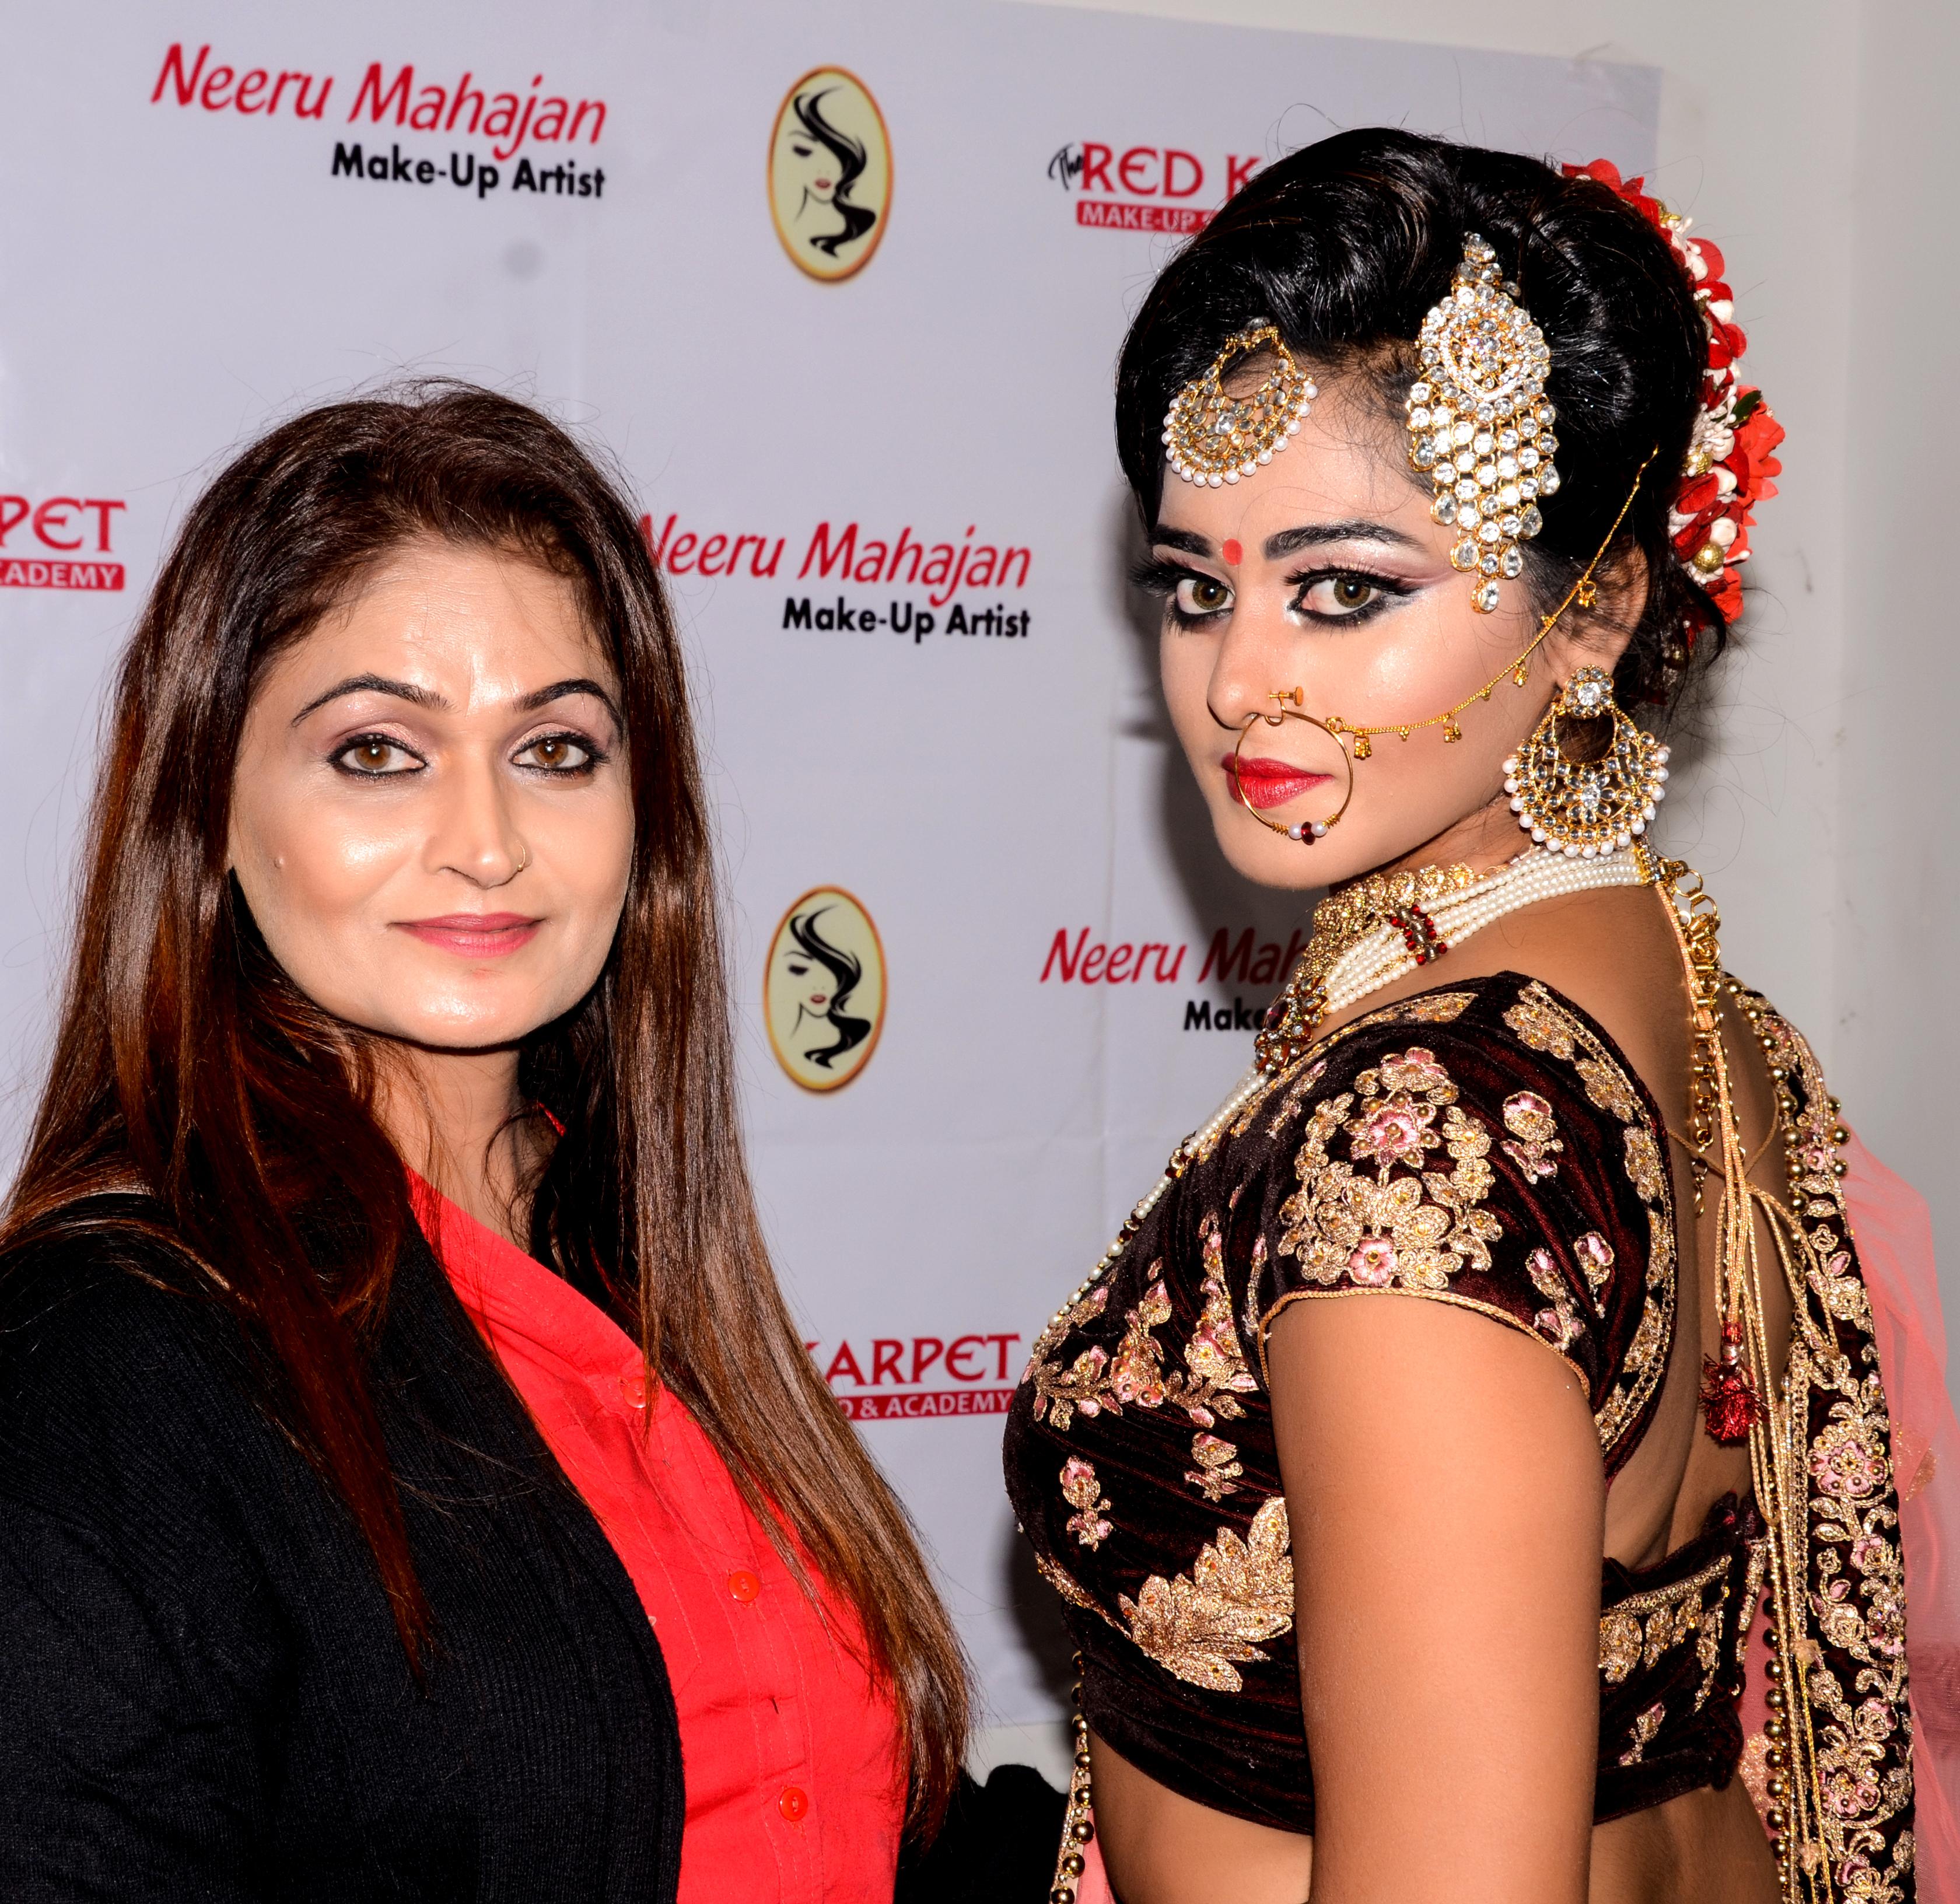 neeru-mahajan-makeup-artist-delhi-ncr